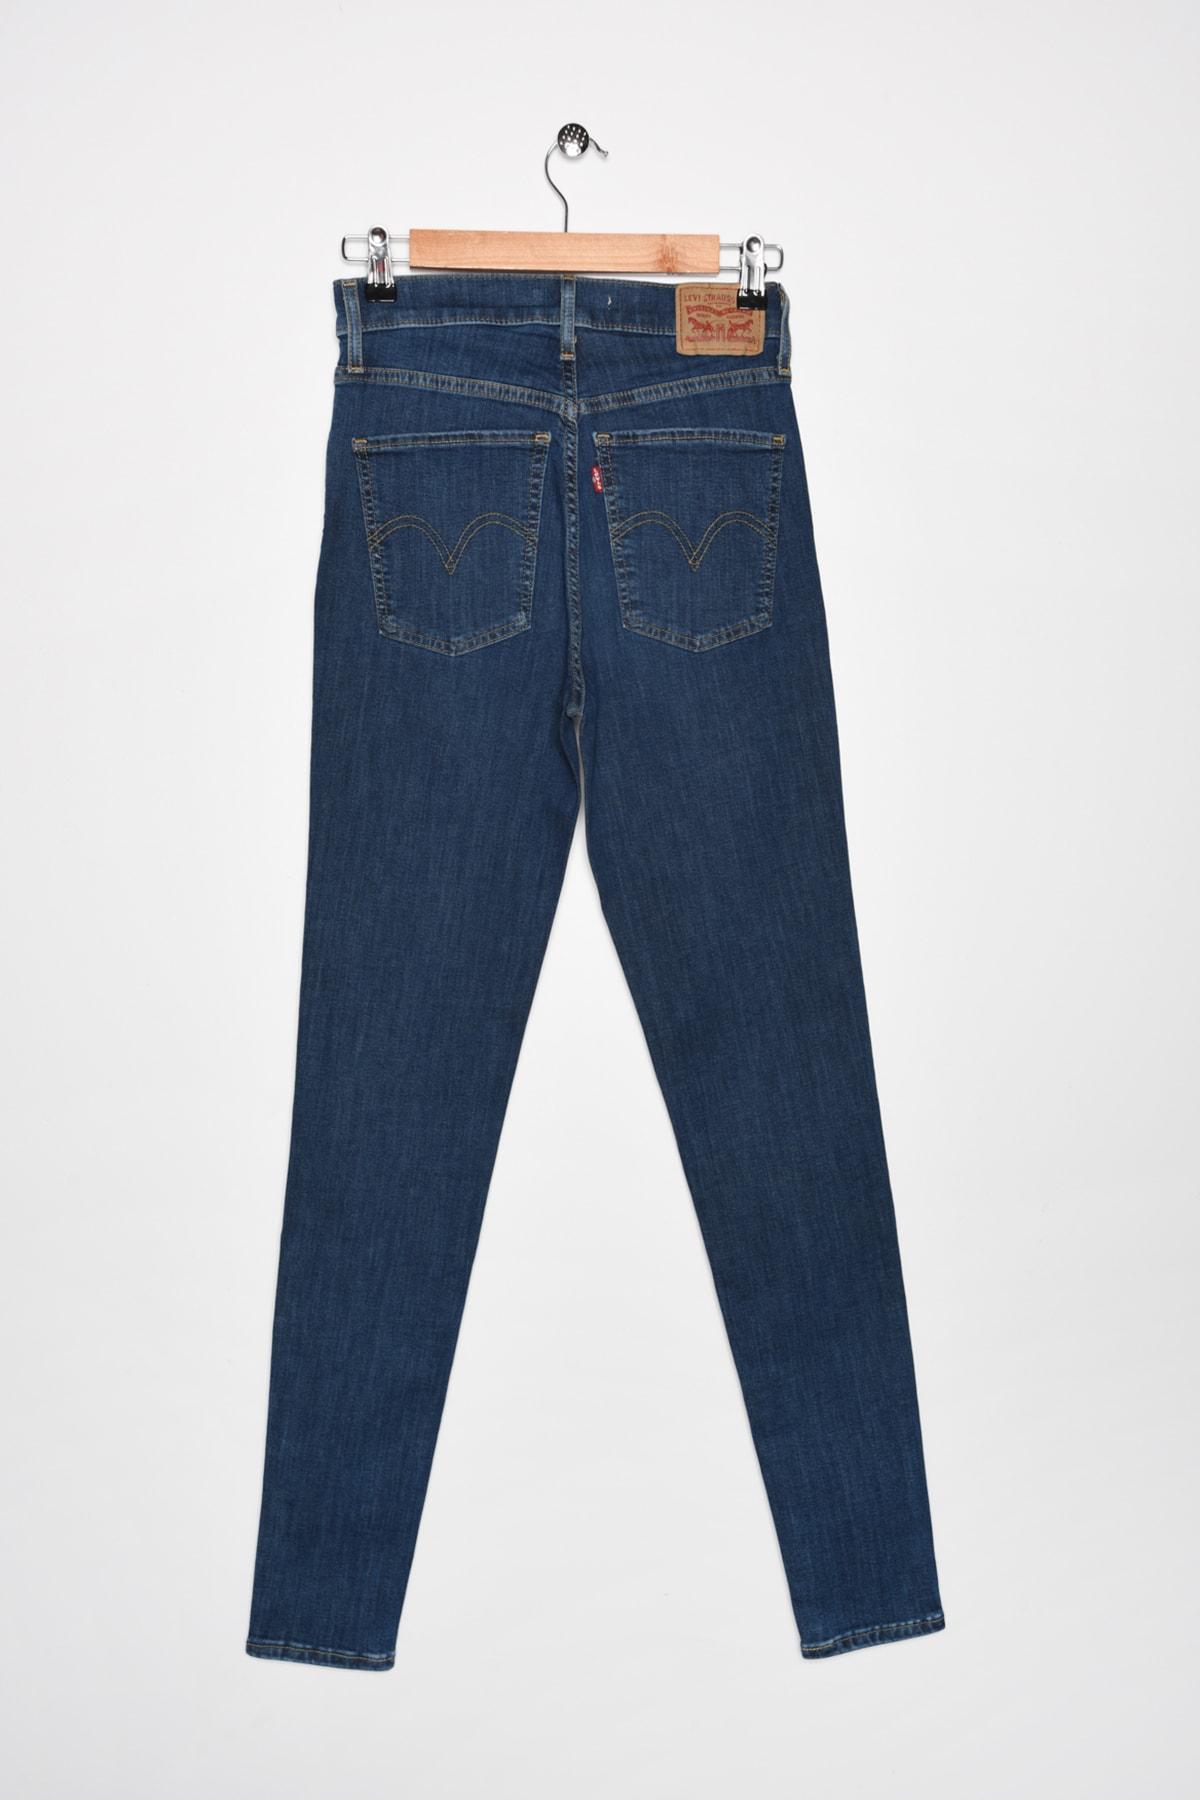 Levi's Kadın High Rise Super Skinny Jeans 22791-0164 2